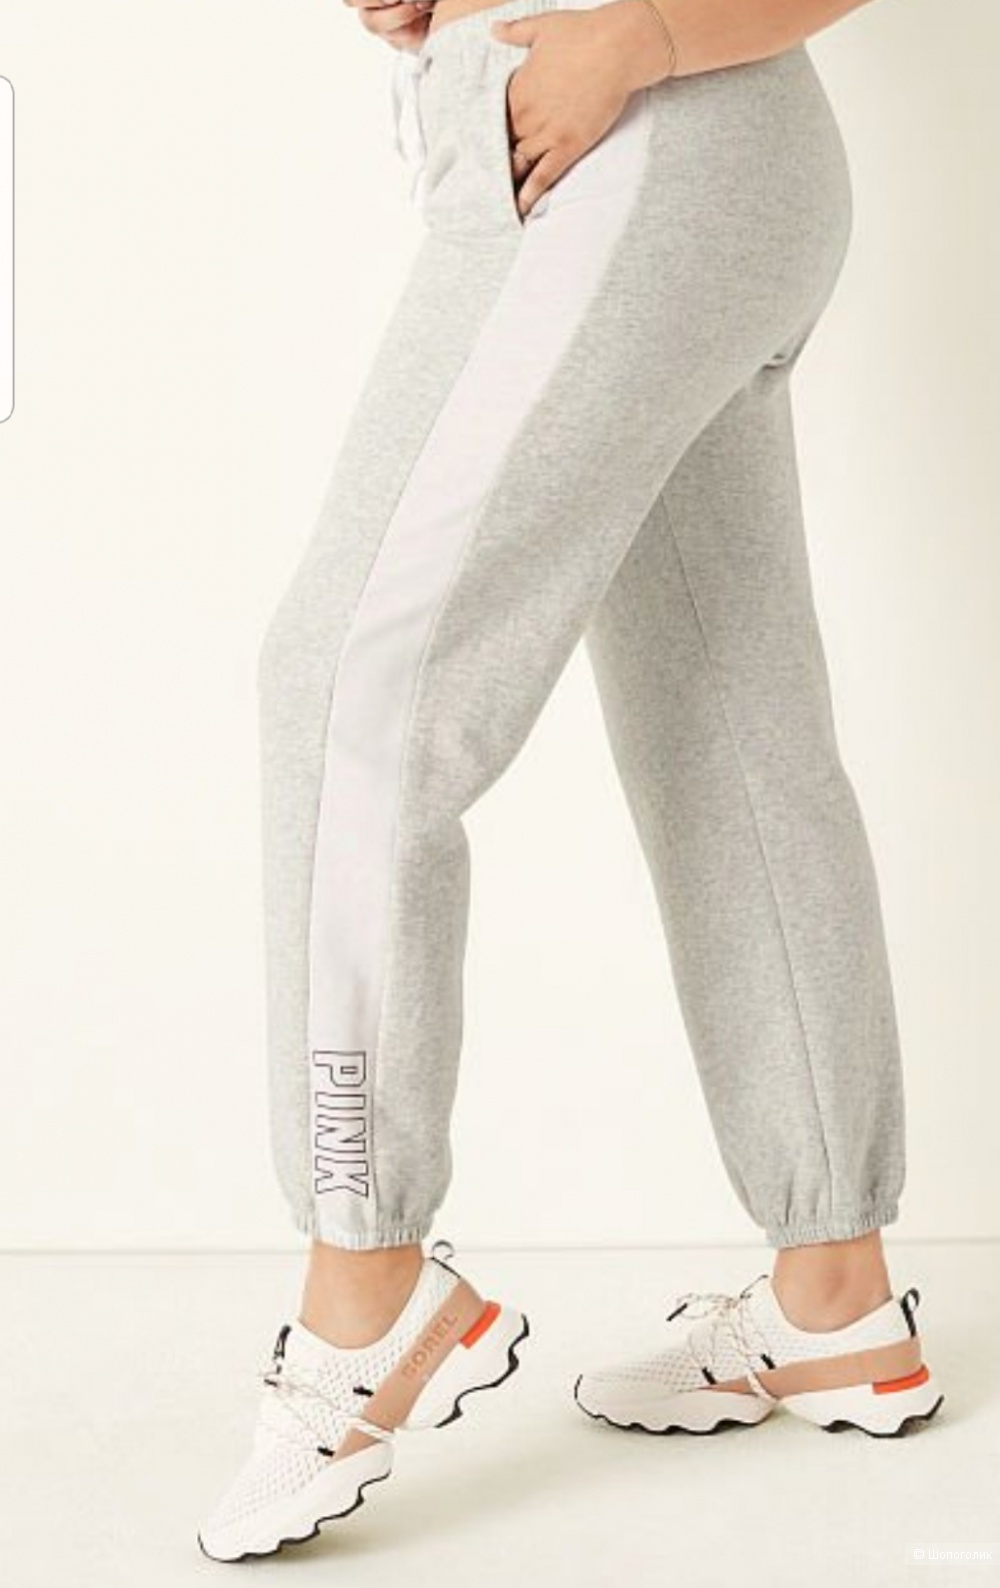 Спортивные брюки Pink Victoria's Secret,  S